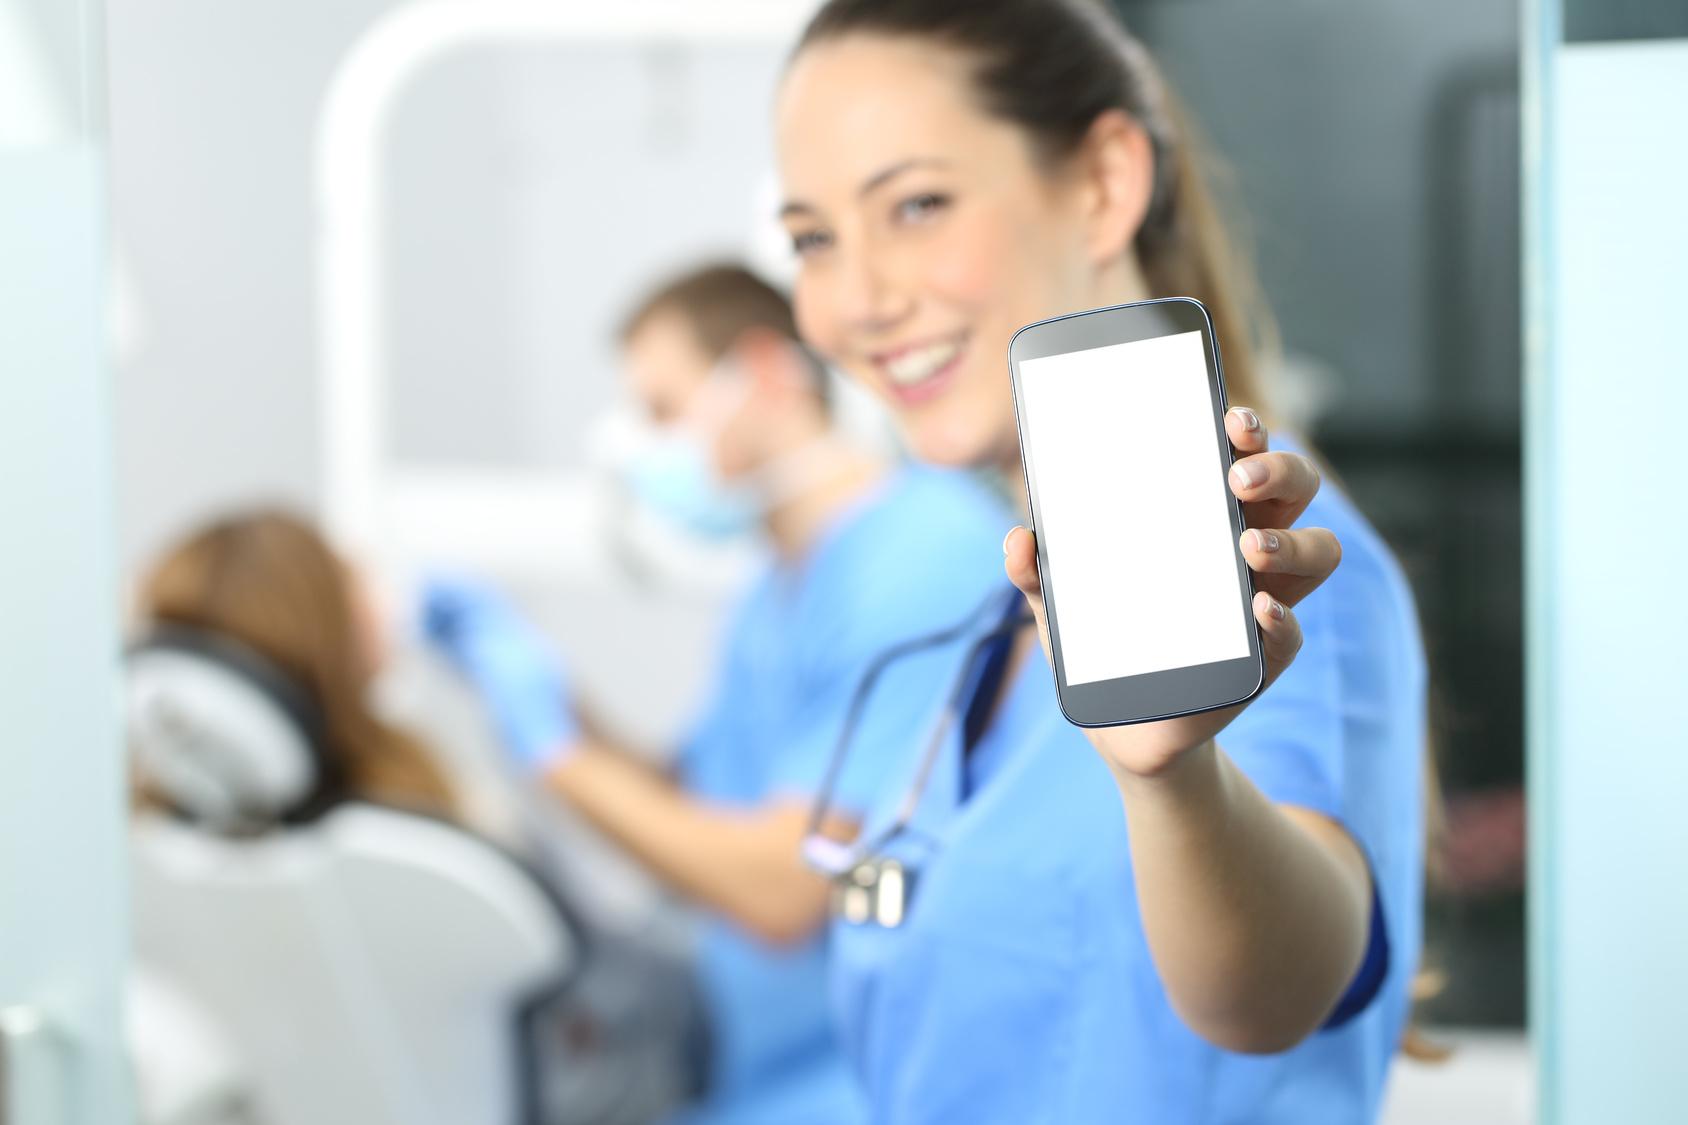 Female dentist showing phone screen